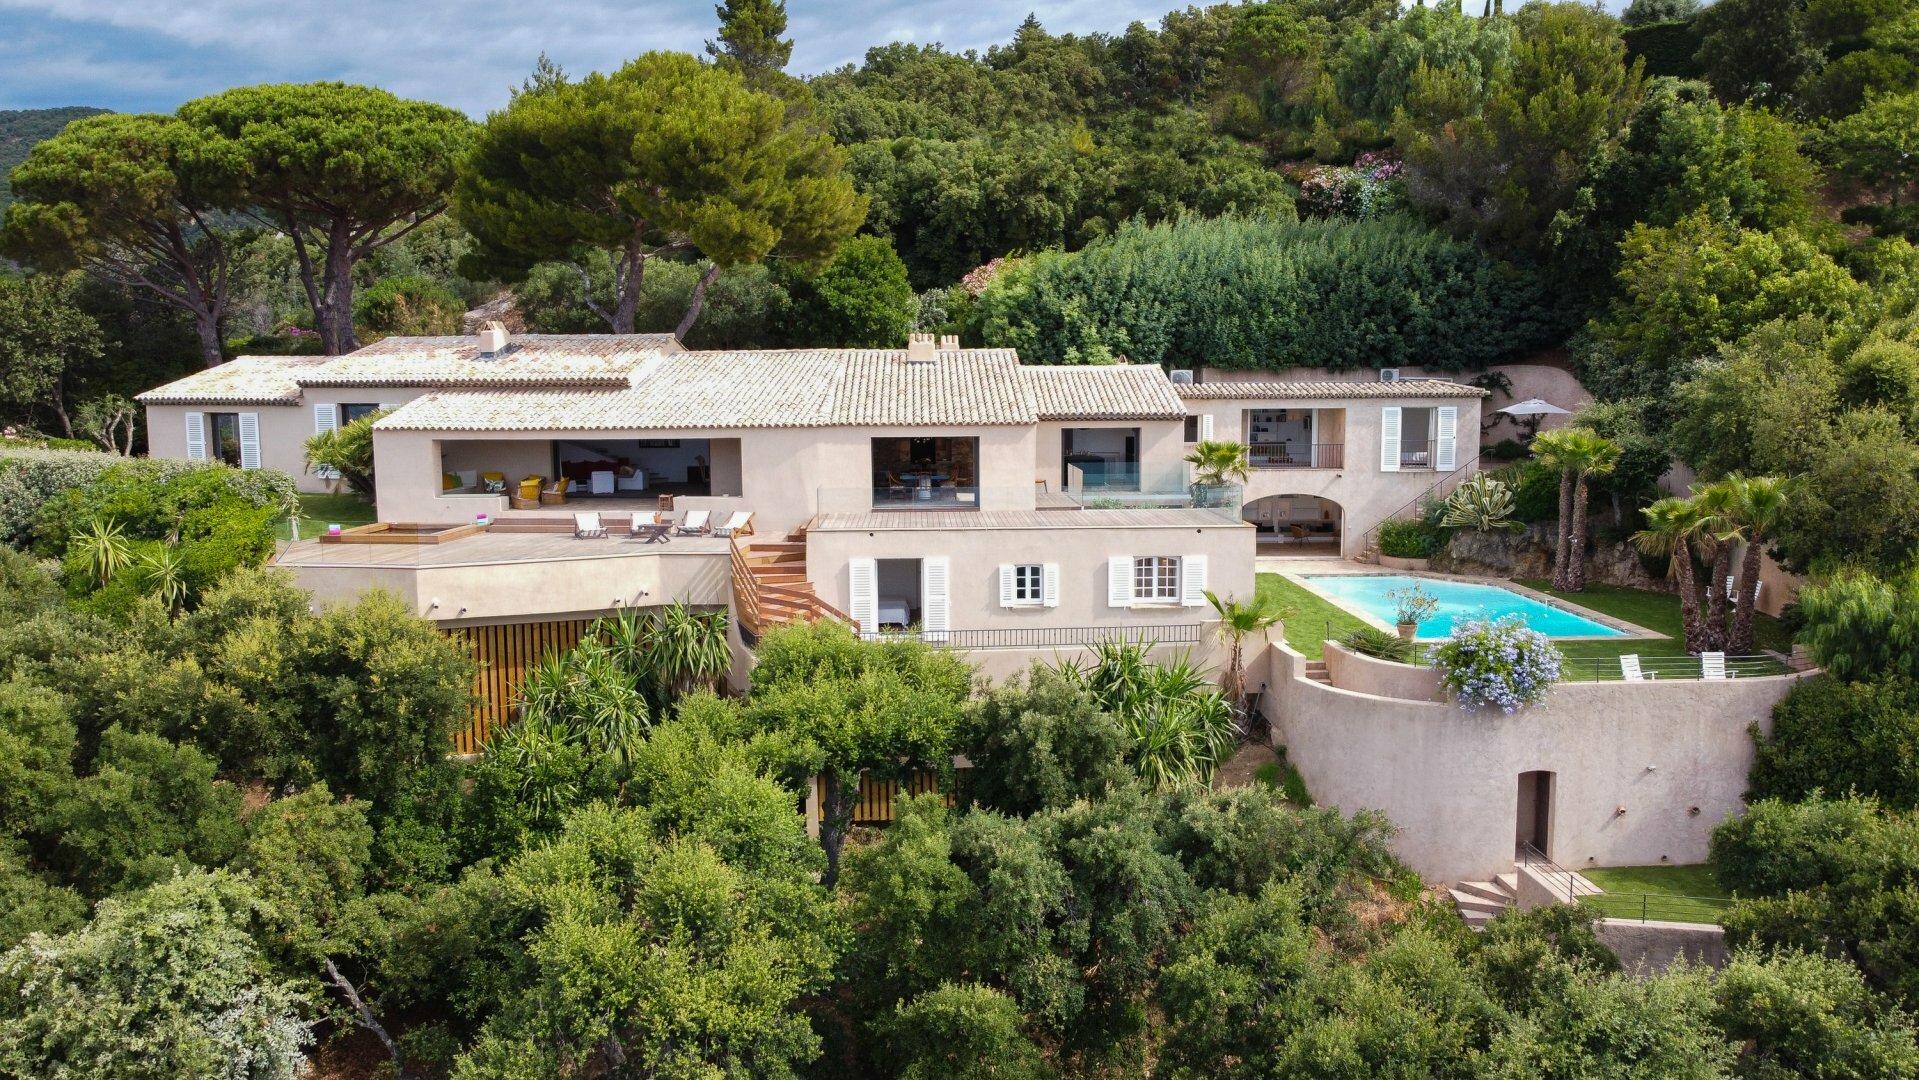 House in Grimaud, Provence-Alpes-Côte d'Azur, France 1 - 11566434